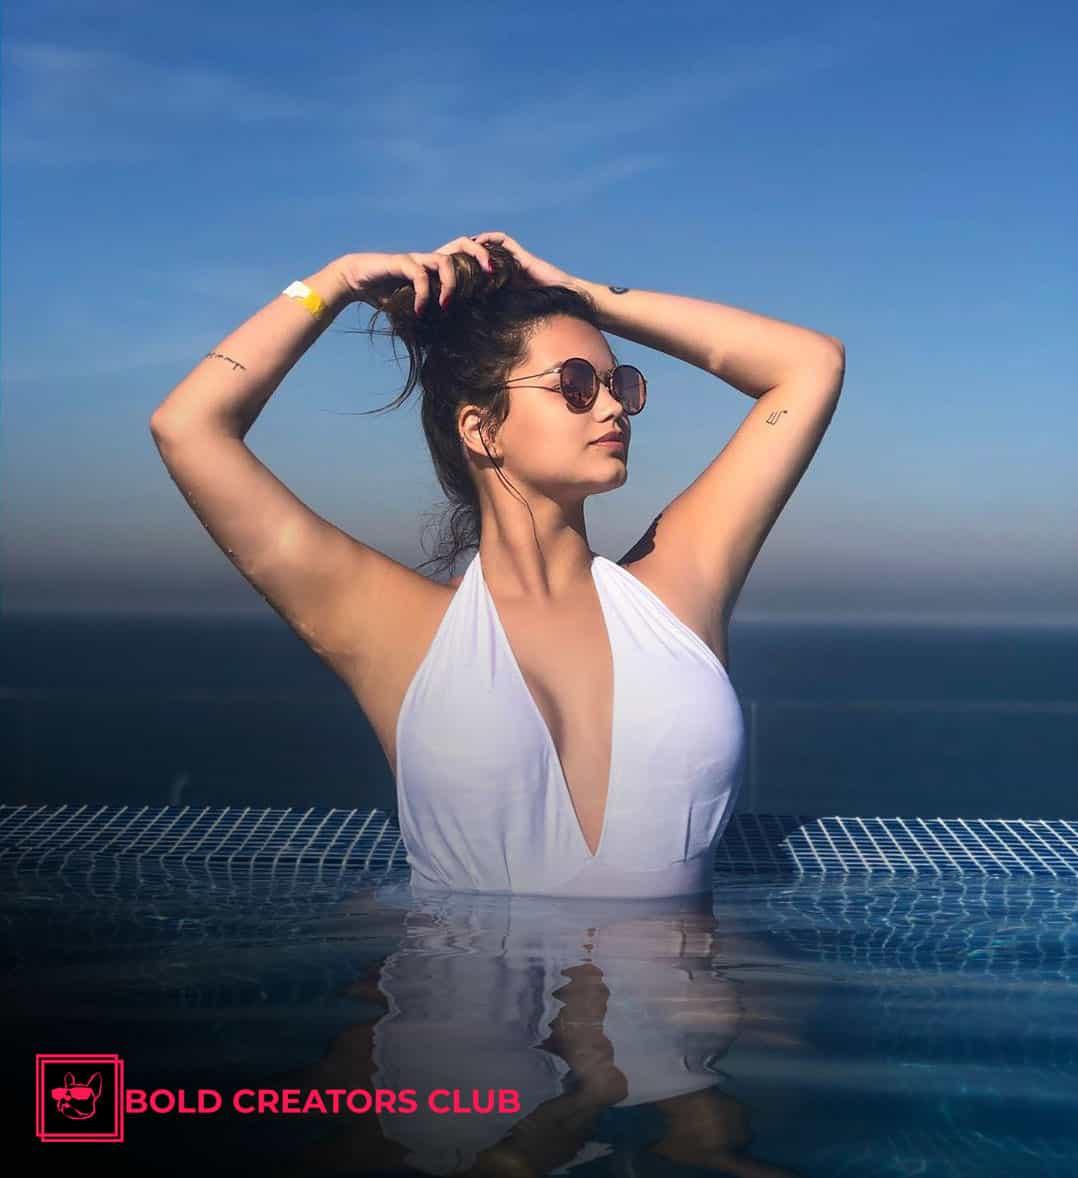 Suzanna Freitas Bold Creators Club Influencer Marketing Agency South America Brazil